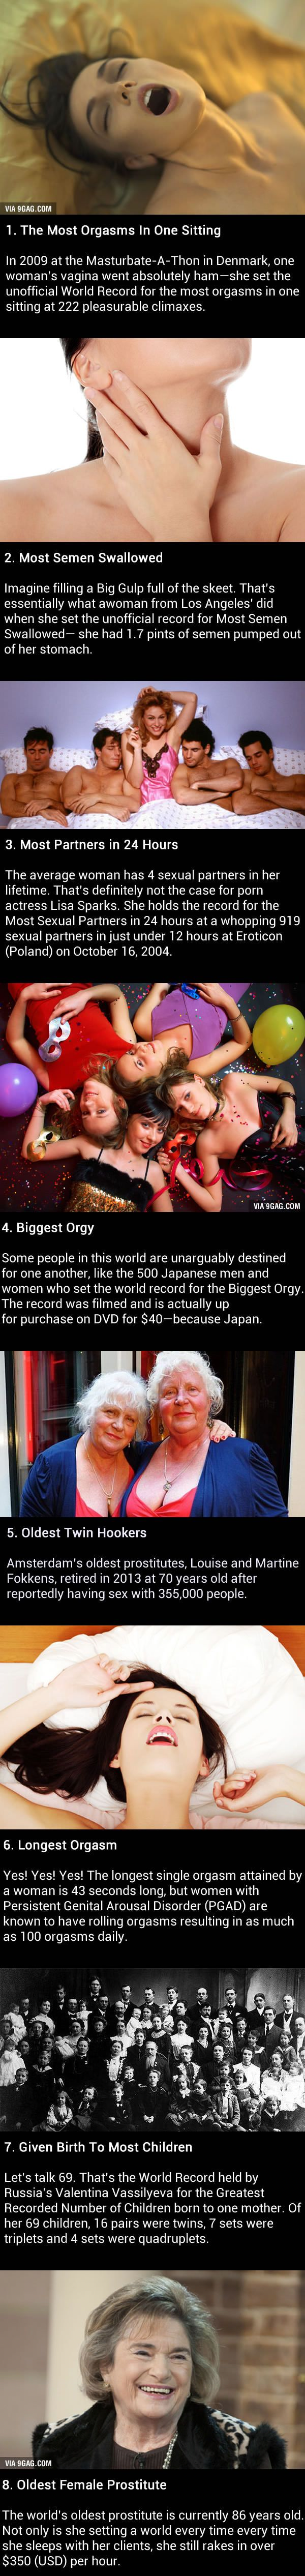 World record for having sex foto 98